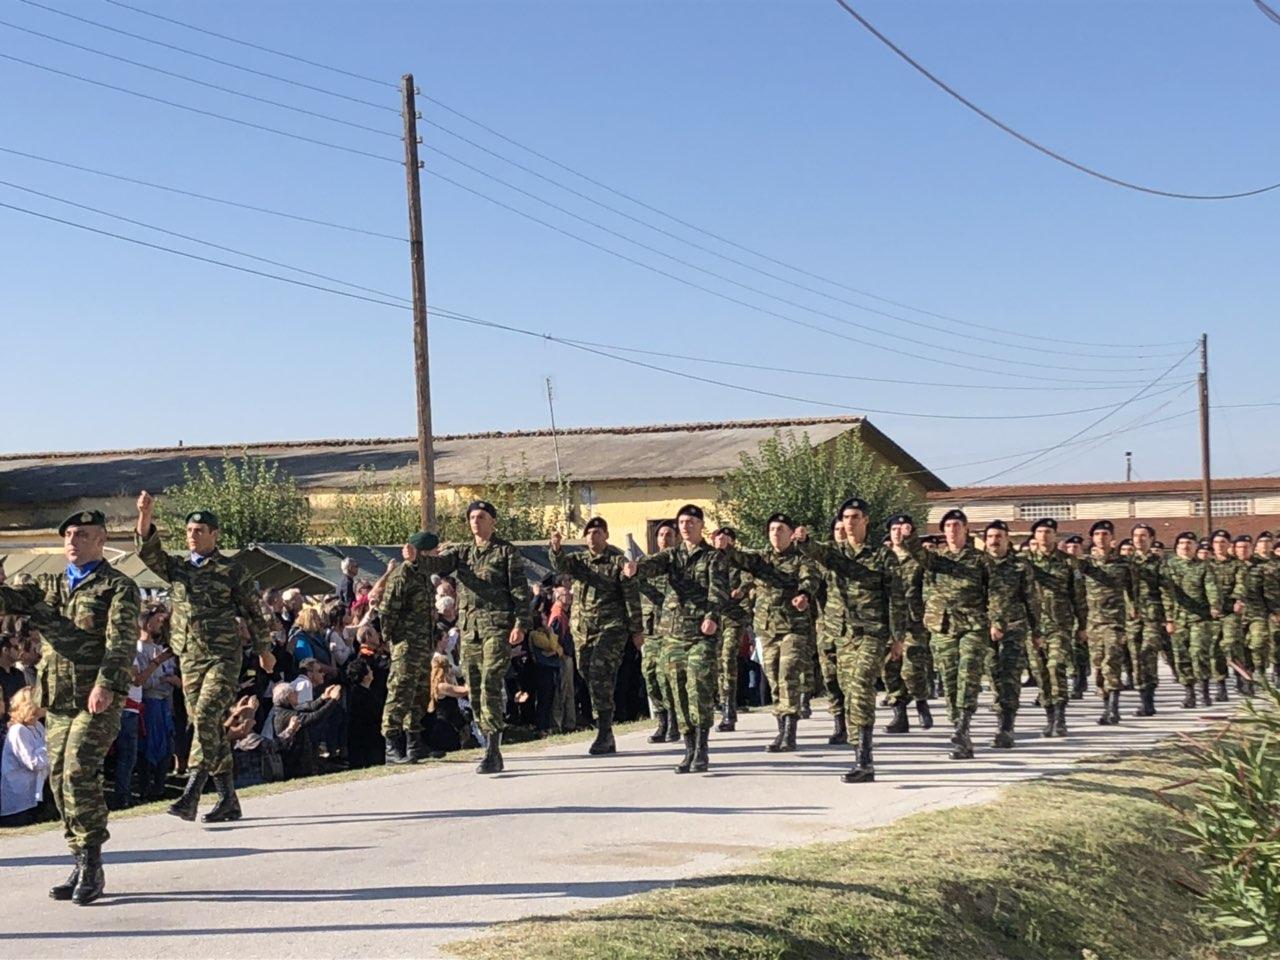 "orkomosia mpouga 4 - Στην ορκωμοσία νέων οπλιτών στο Στρατόπεδο ""Μπουγά"" ο Σεβασμιώτατος"